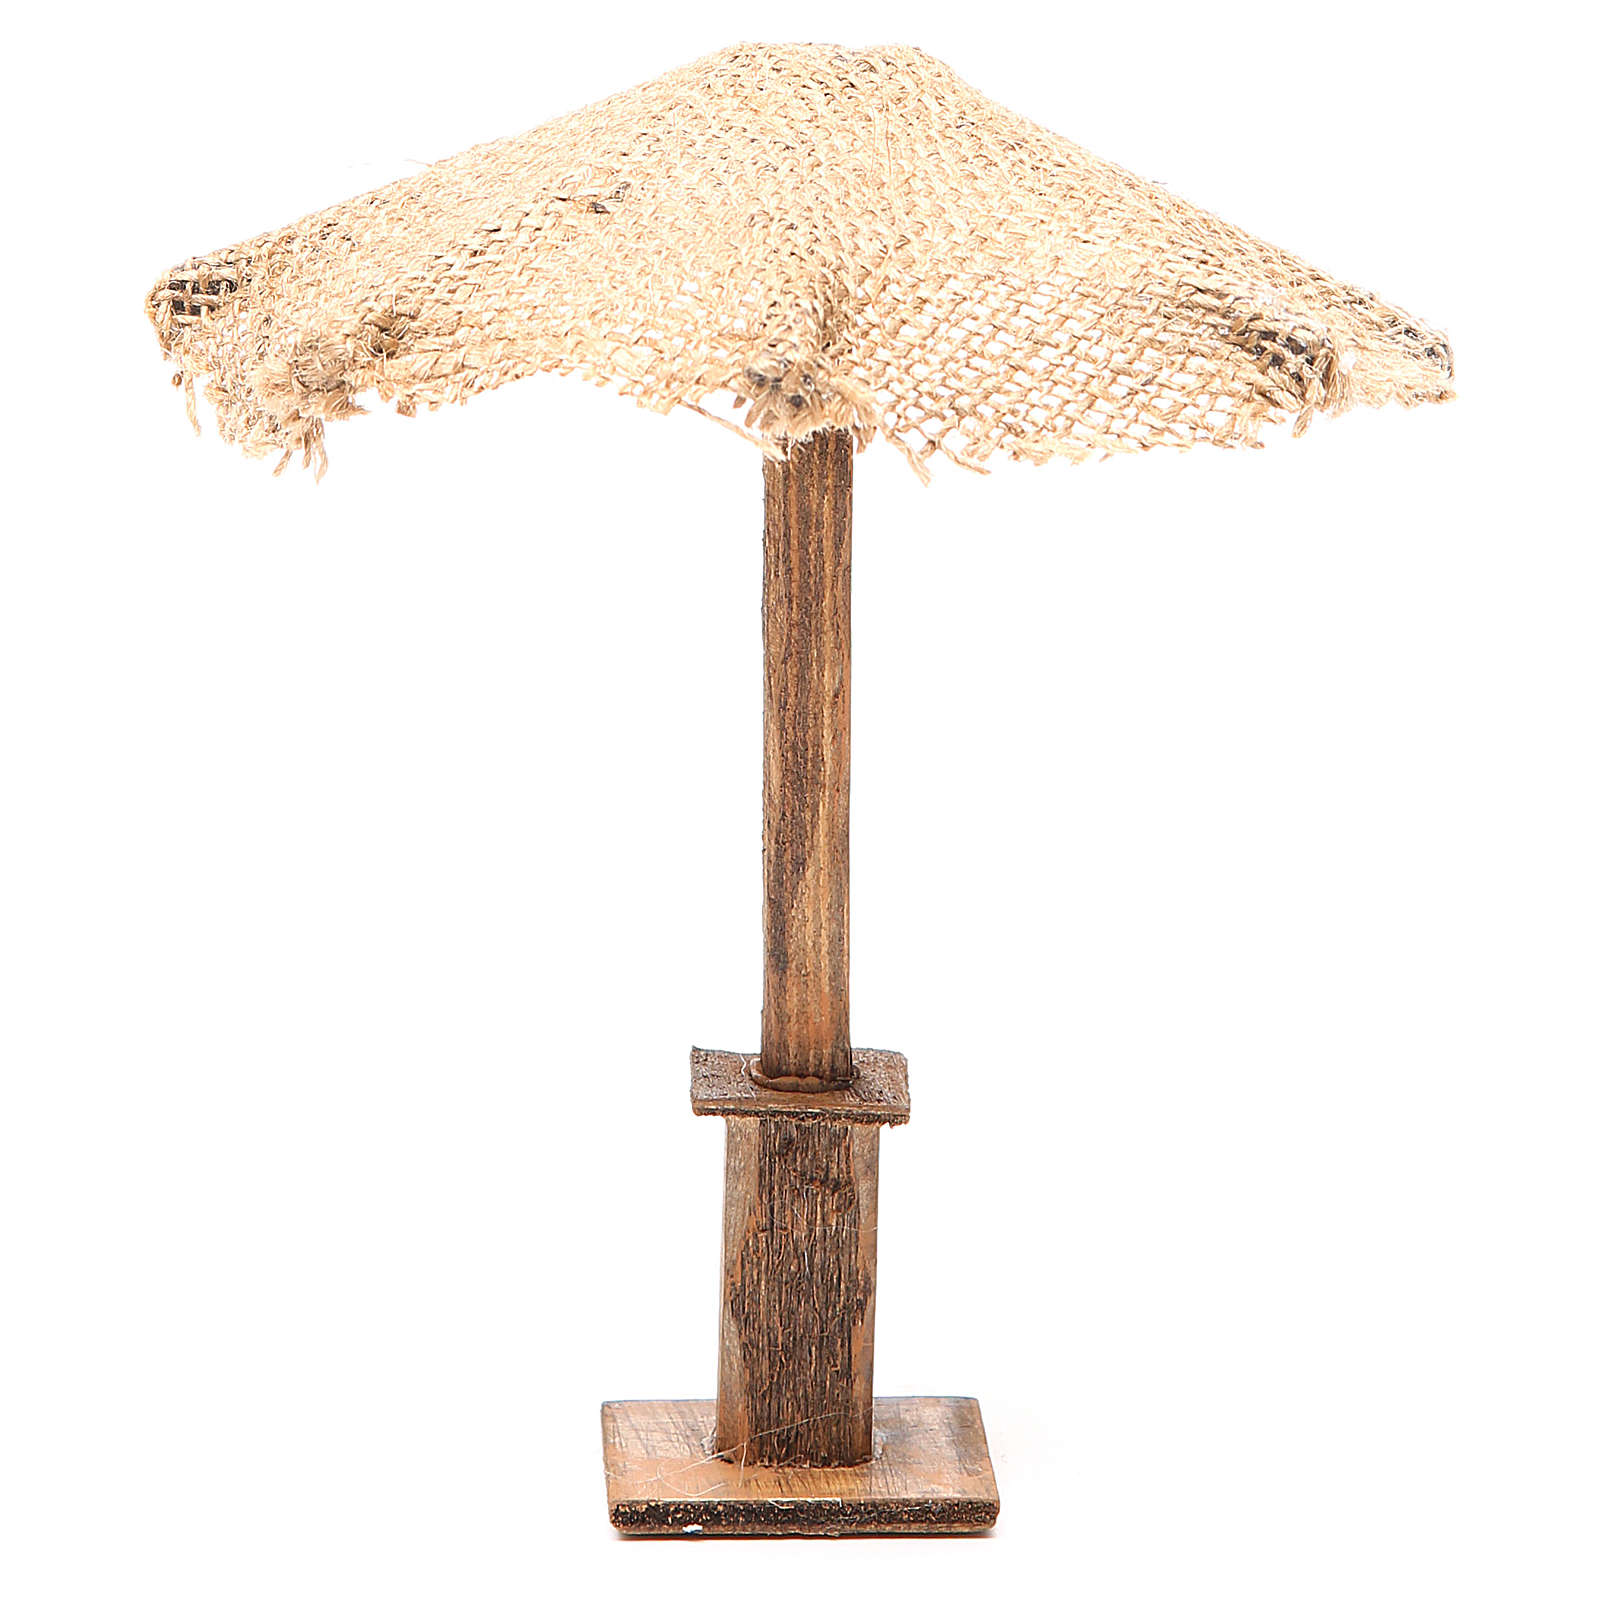 Parasol jute crèche 16x16x16 cm 4